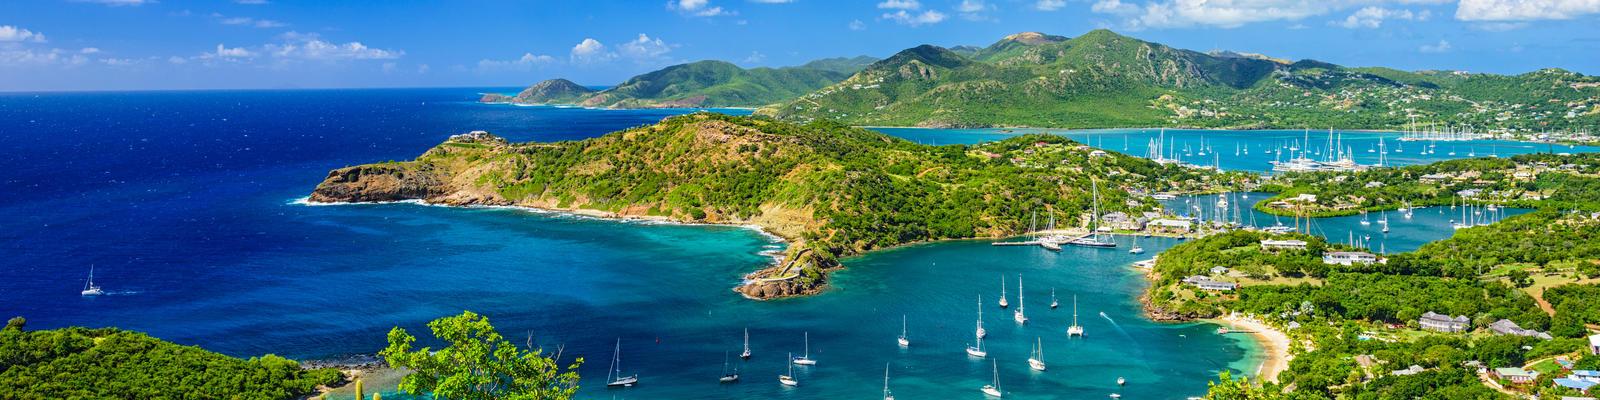 Antigua (Photo: Sean Pavone/Shutterstock.com)